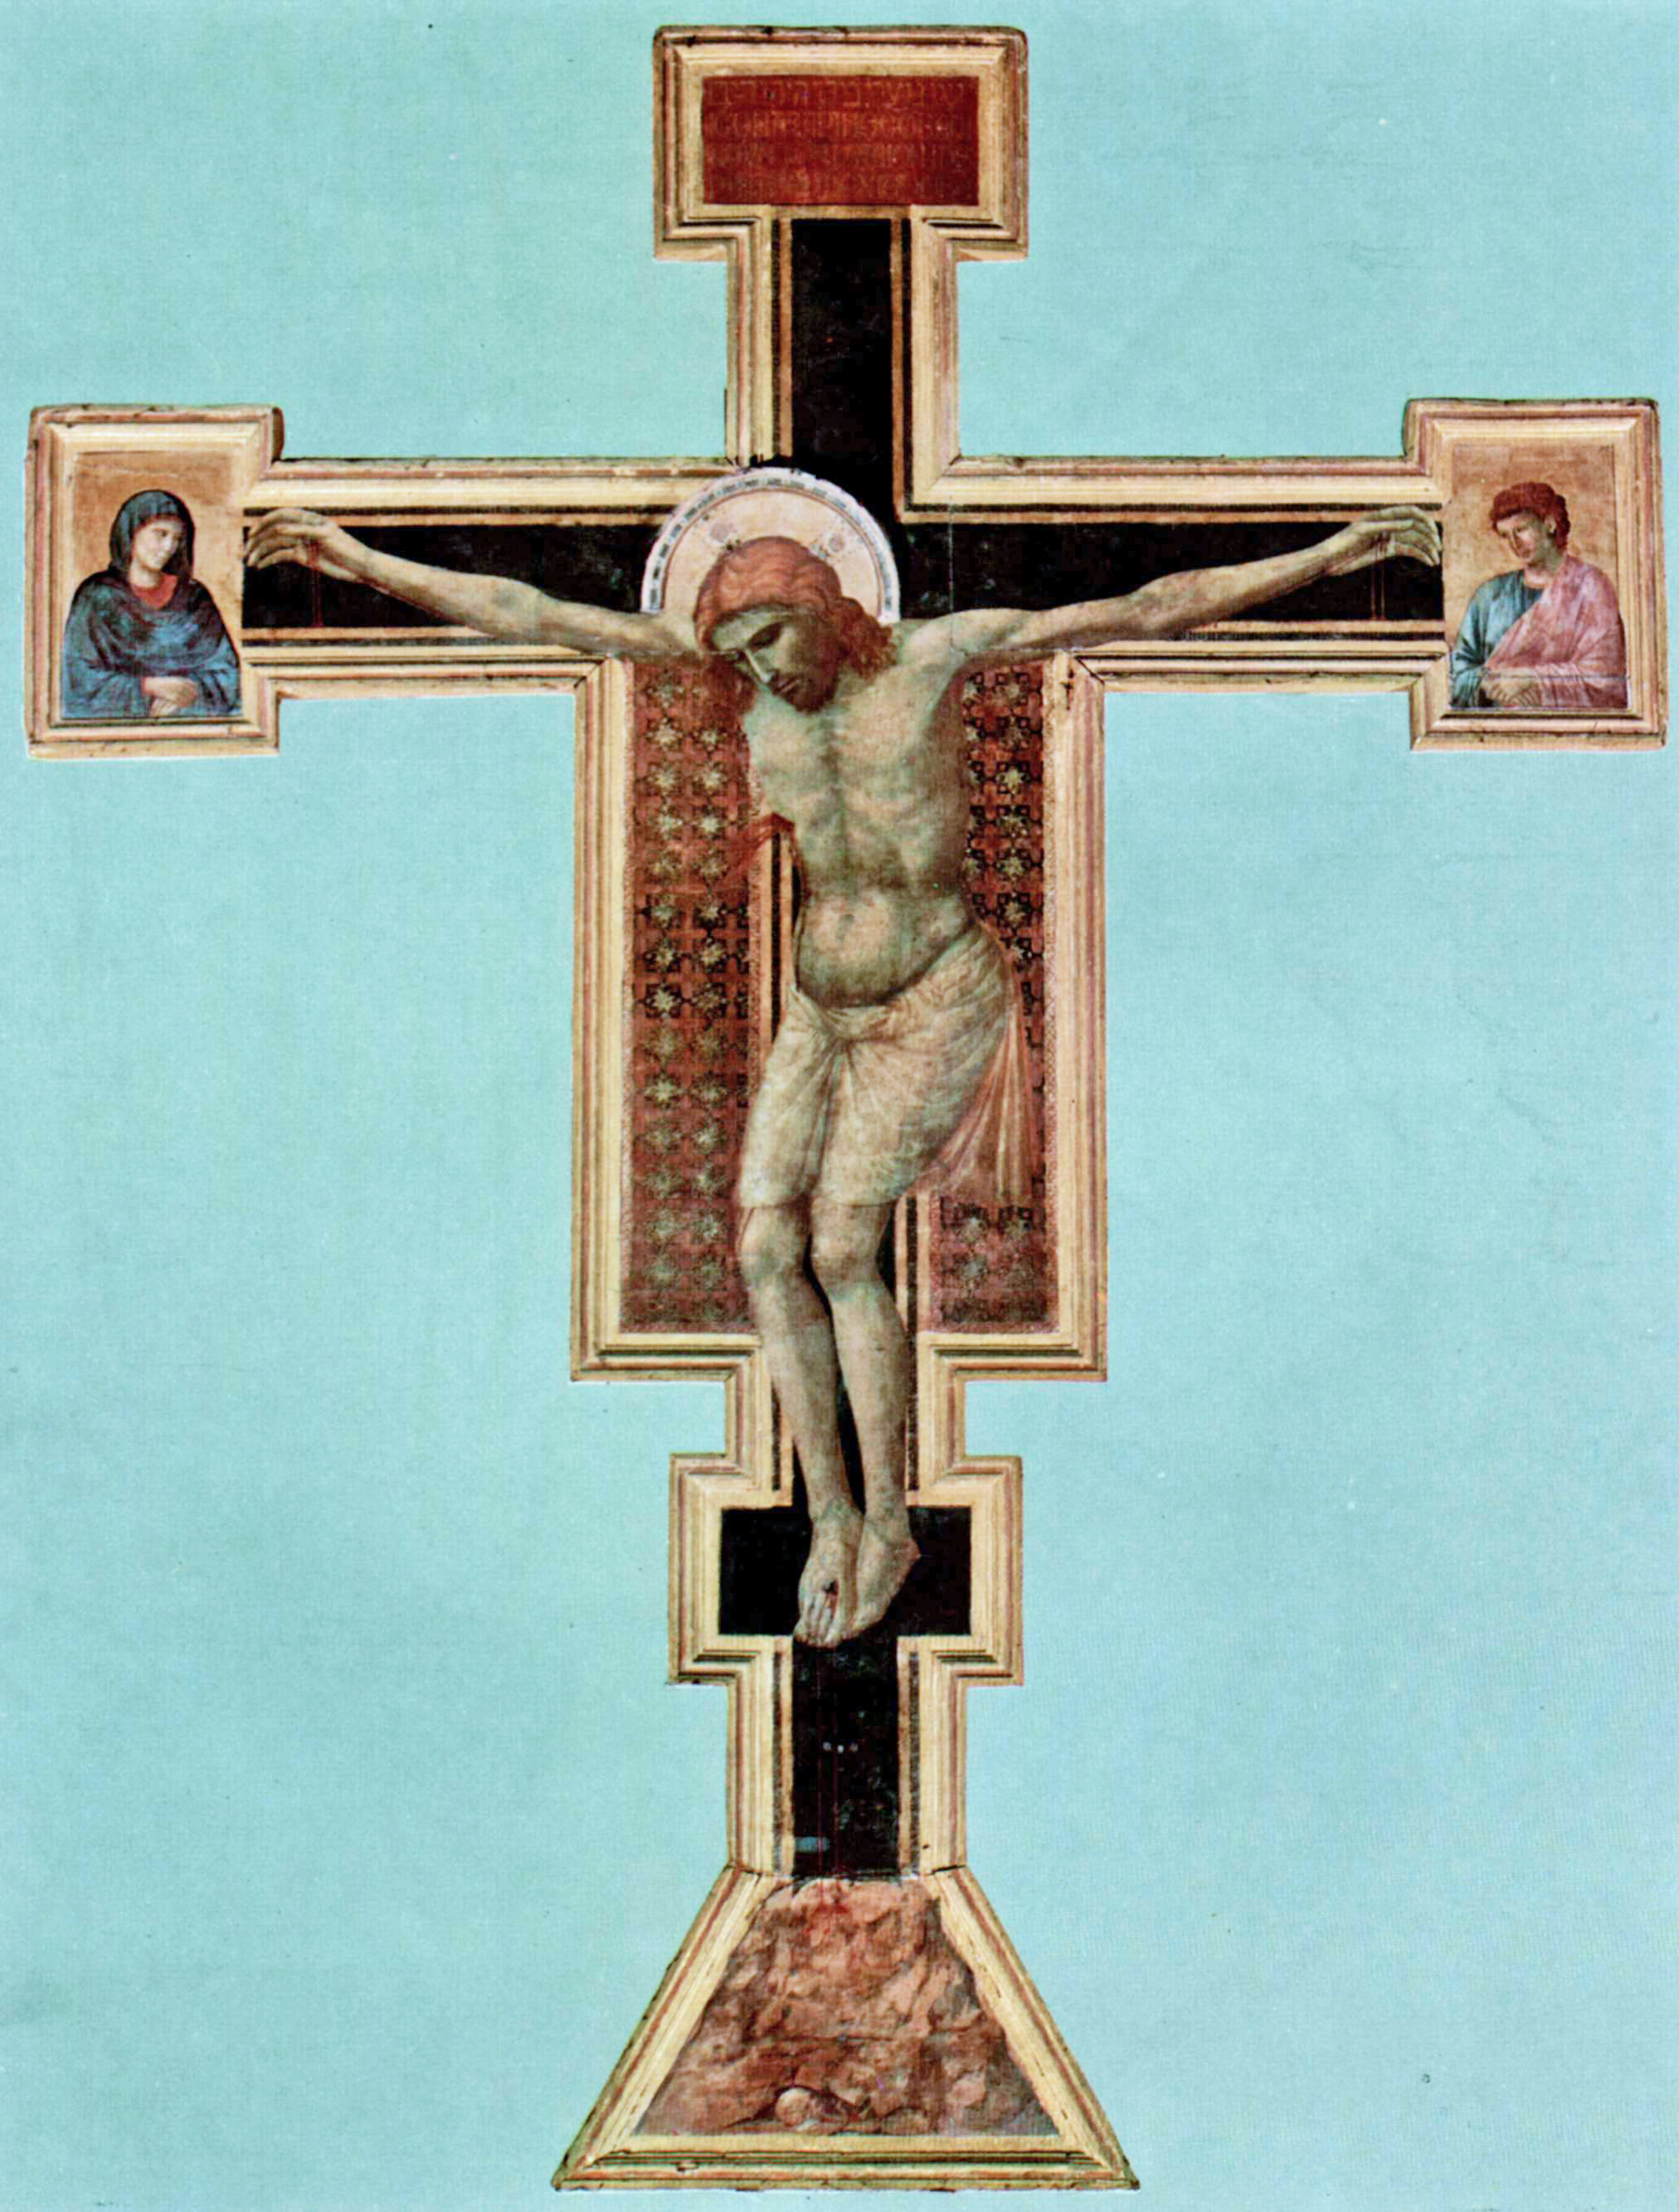 https://upload.wikimedia.org/wikipedia/commons/b/bf/Giotto_di_Bondone_083.jpg